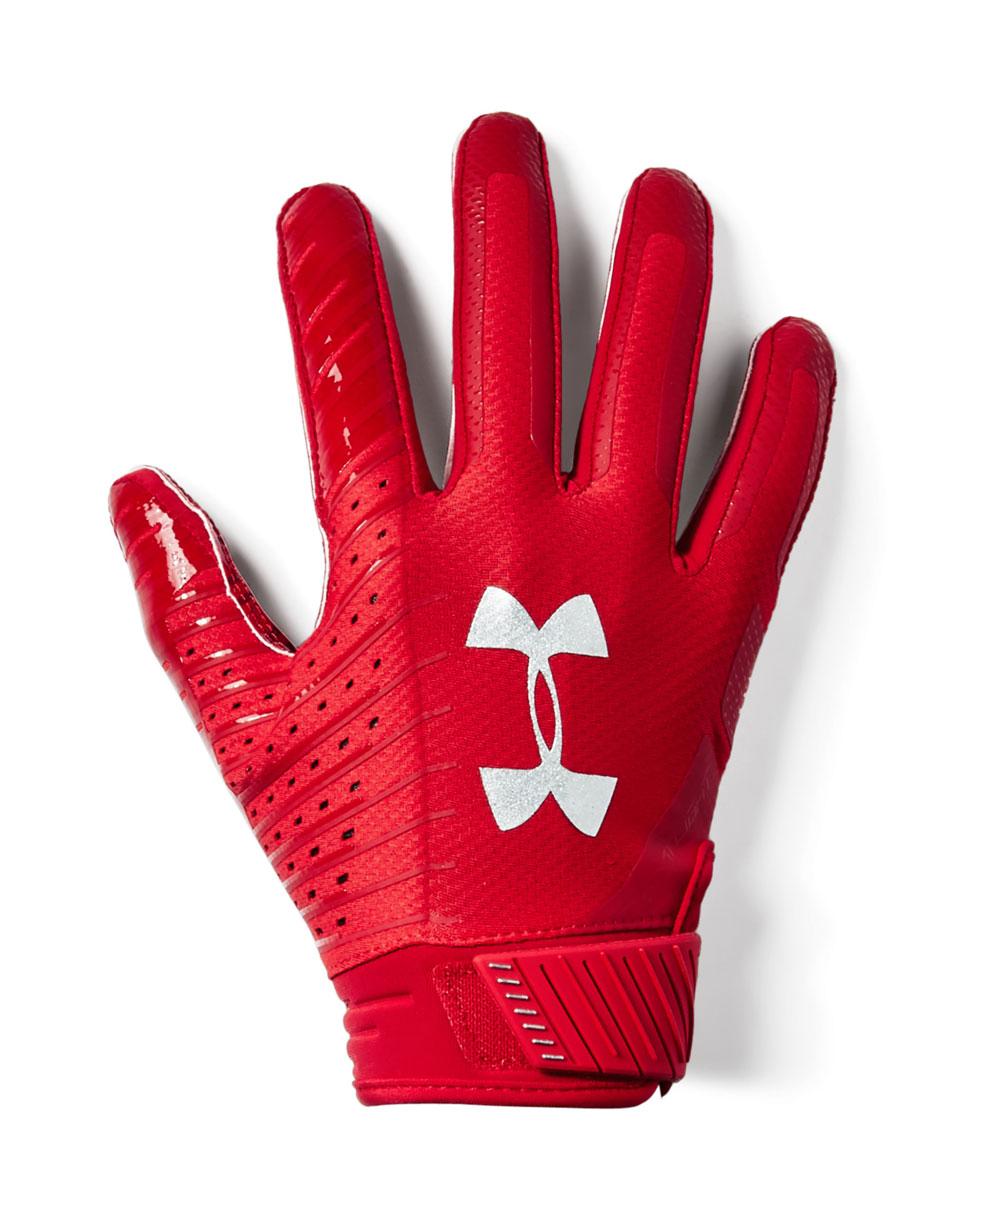 Spotlight Herren American Football Handschuhe Red 600